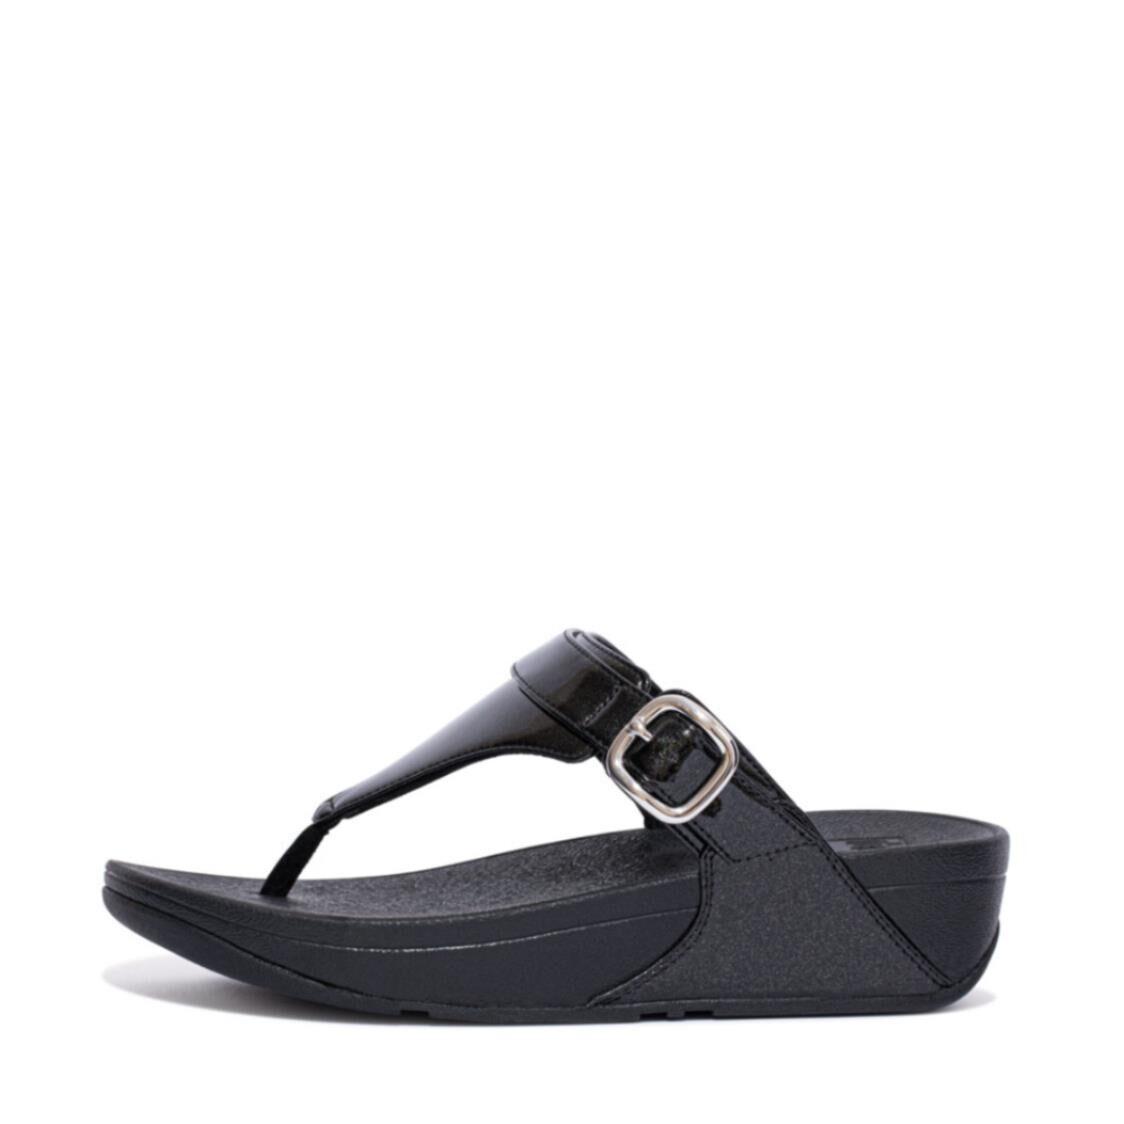 Fitflop Lulu Glitter Adjustable Toe-post Sandals Black EC9-090